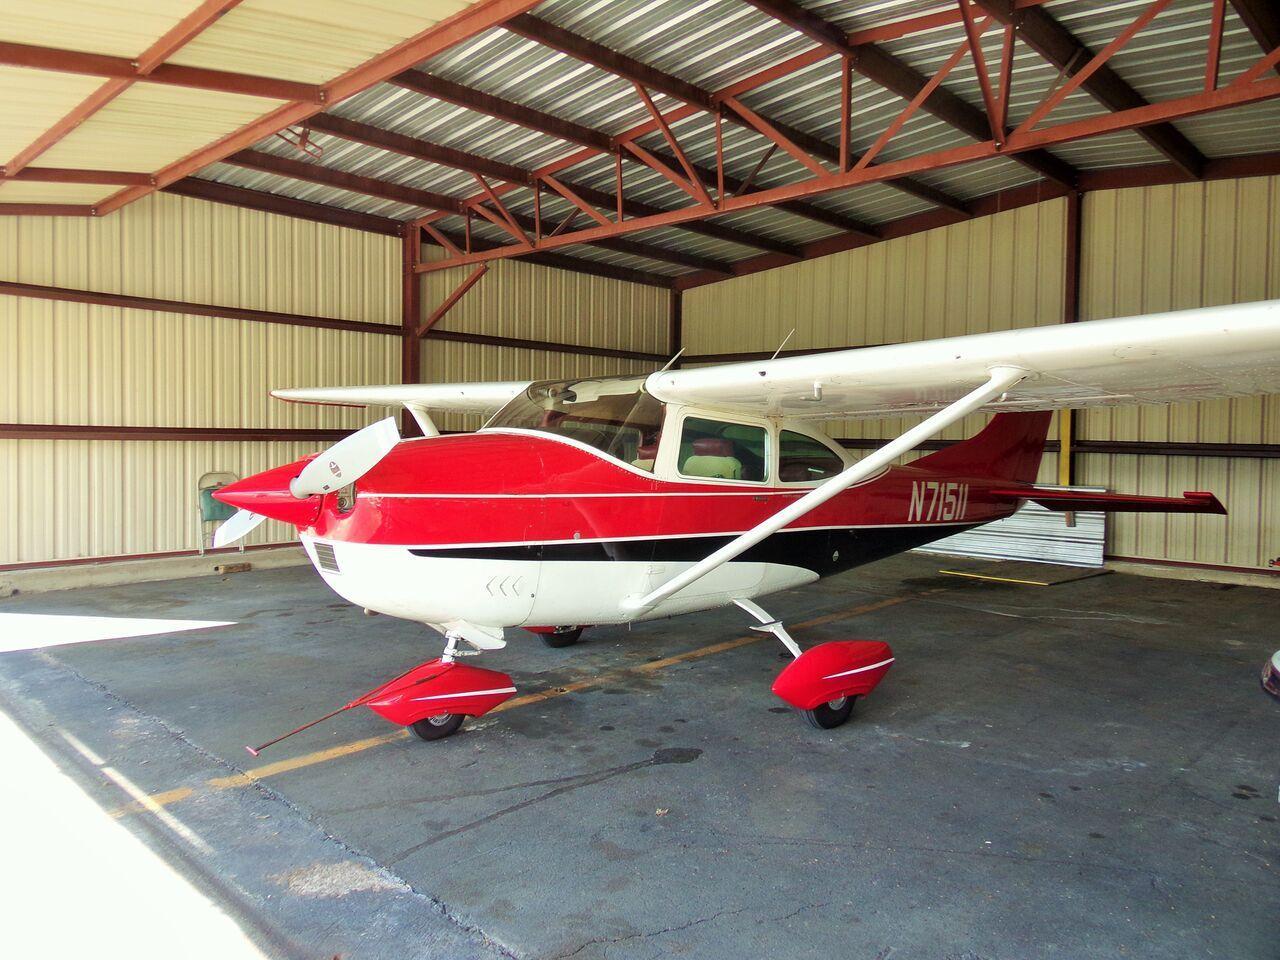 1969 Cessna Skylane